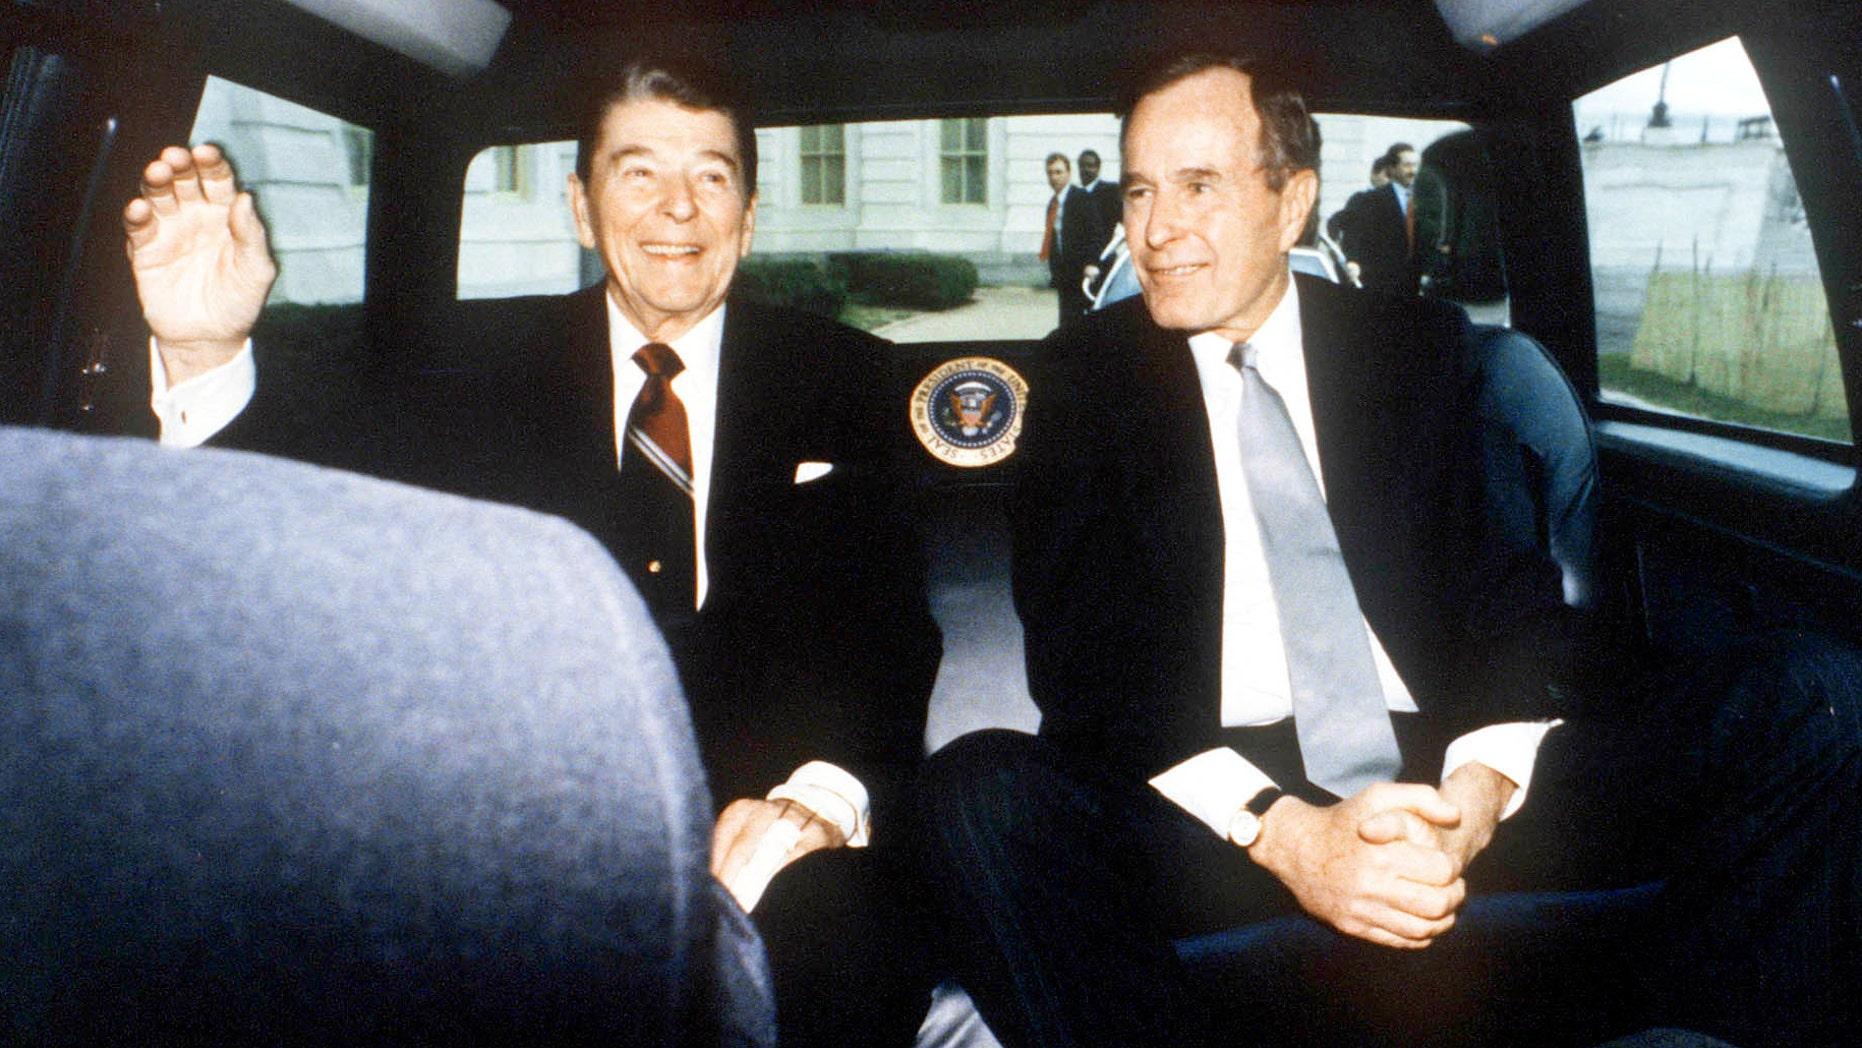 President Reagan and Vice President Bush on January 20, 1989, in Washington, D.C.